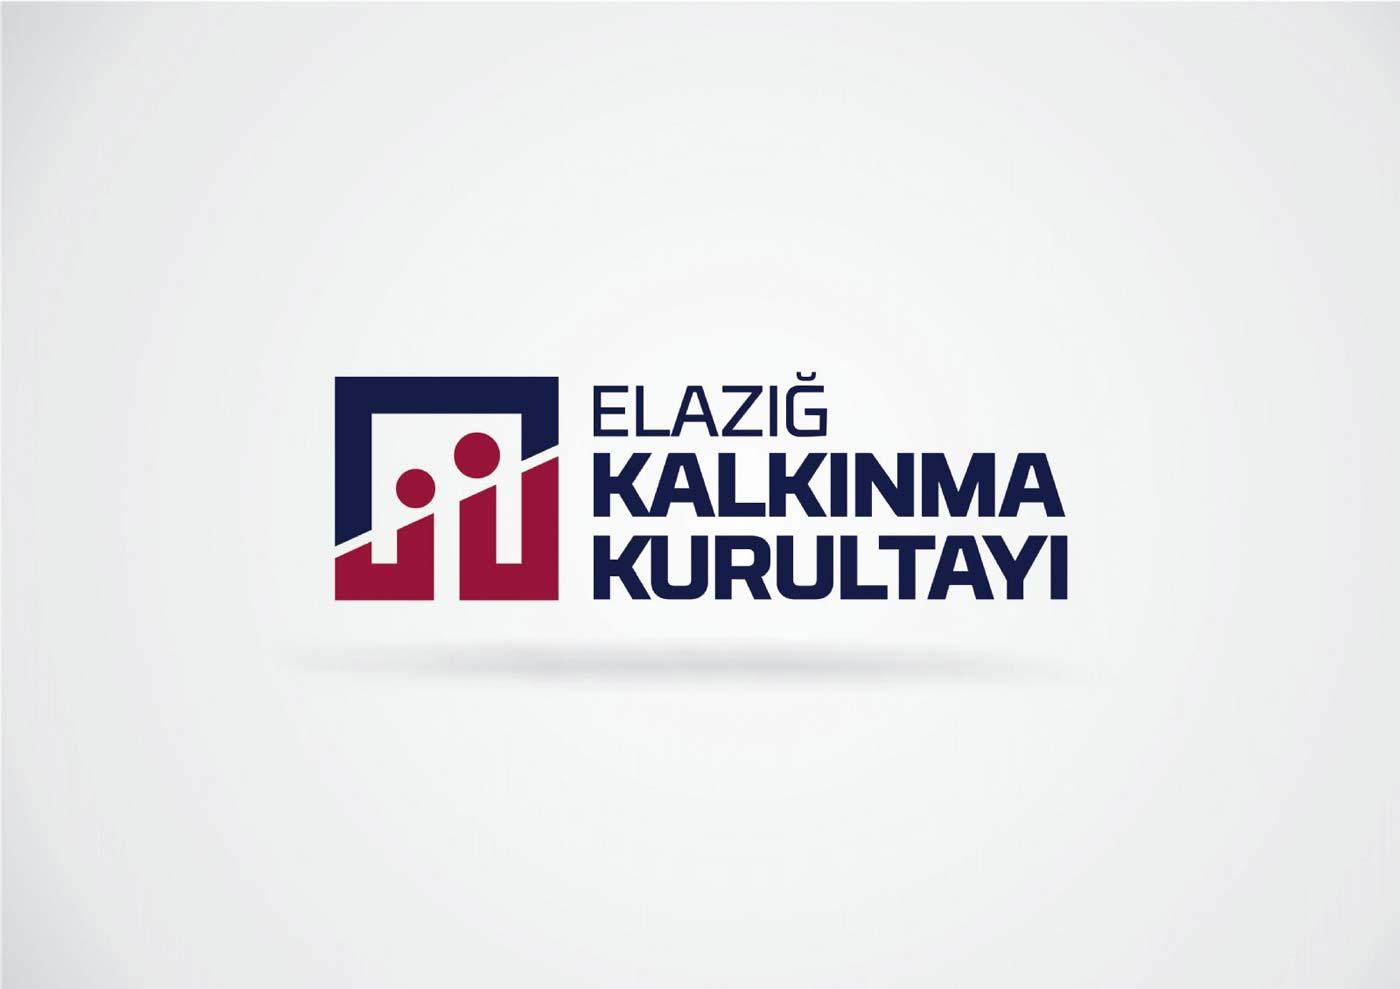 elazig kalkinma kurultayi logo